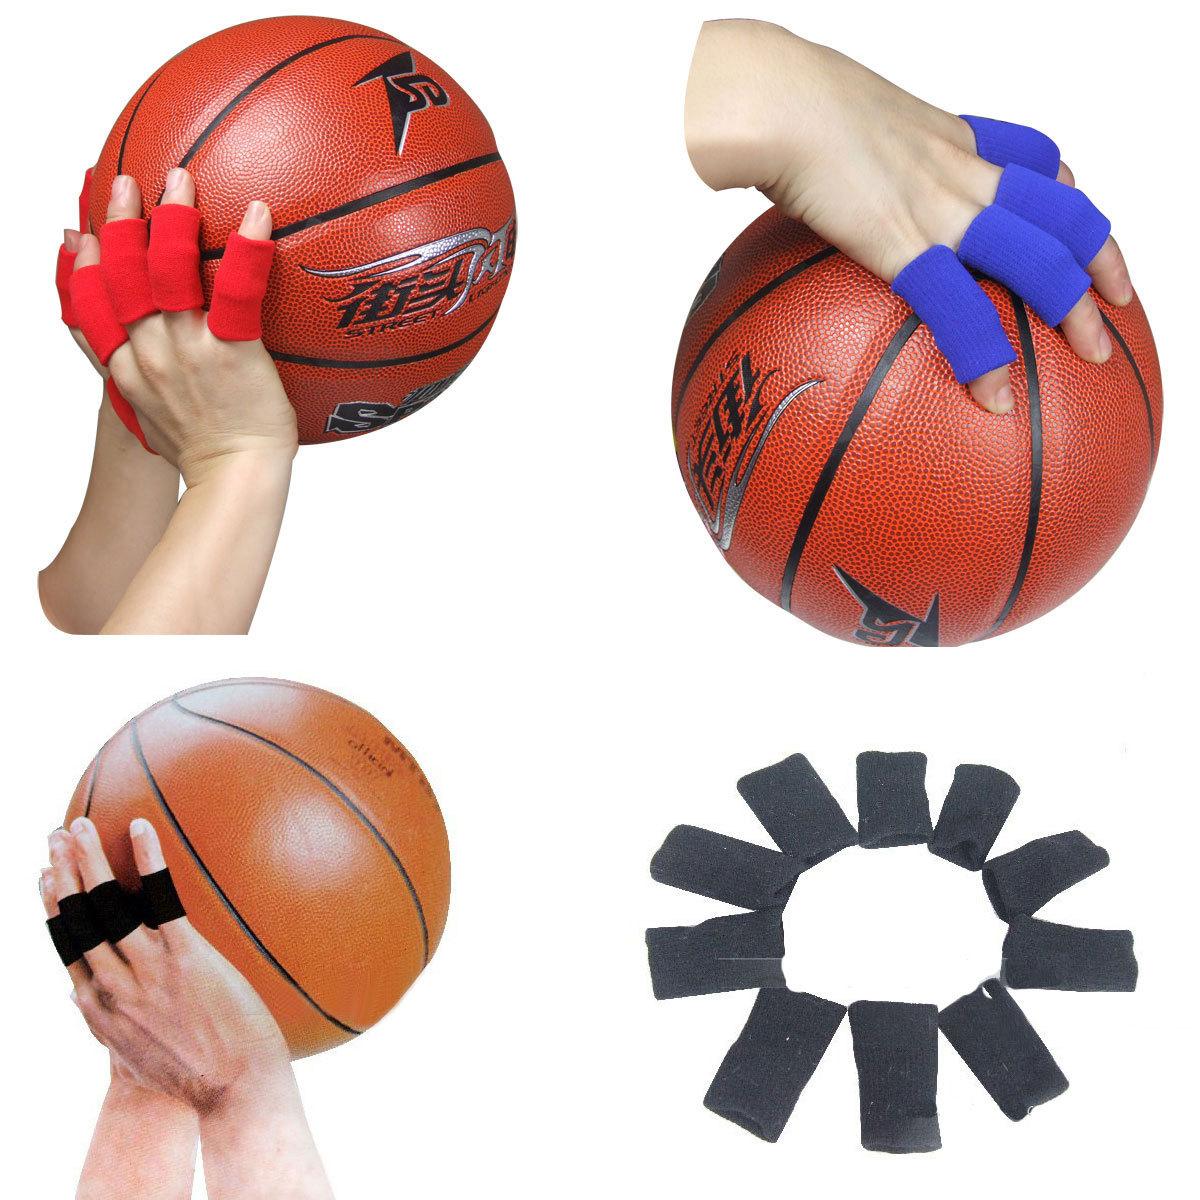 Adey Camping Equipment Basketball Fingerstall Slip-resistant Belt Elastic Professional Volleyball Flanchard Finger Sheath Ring(China (Mainland))